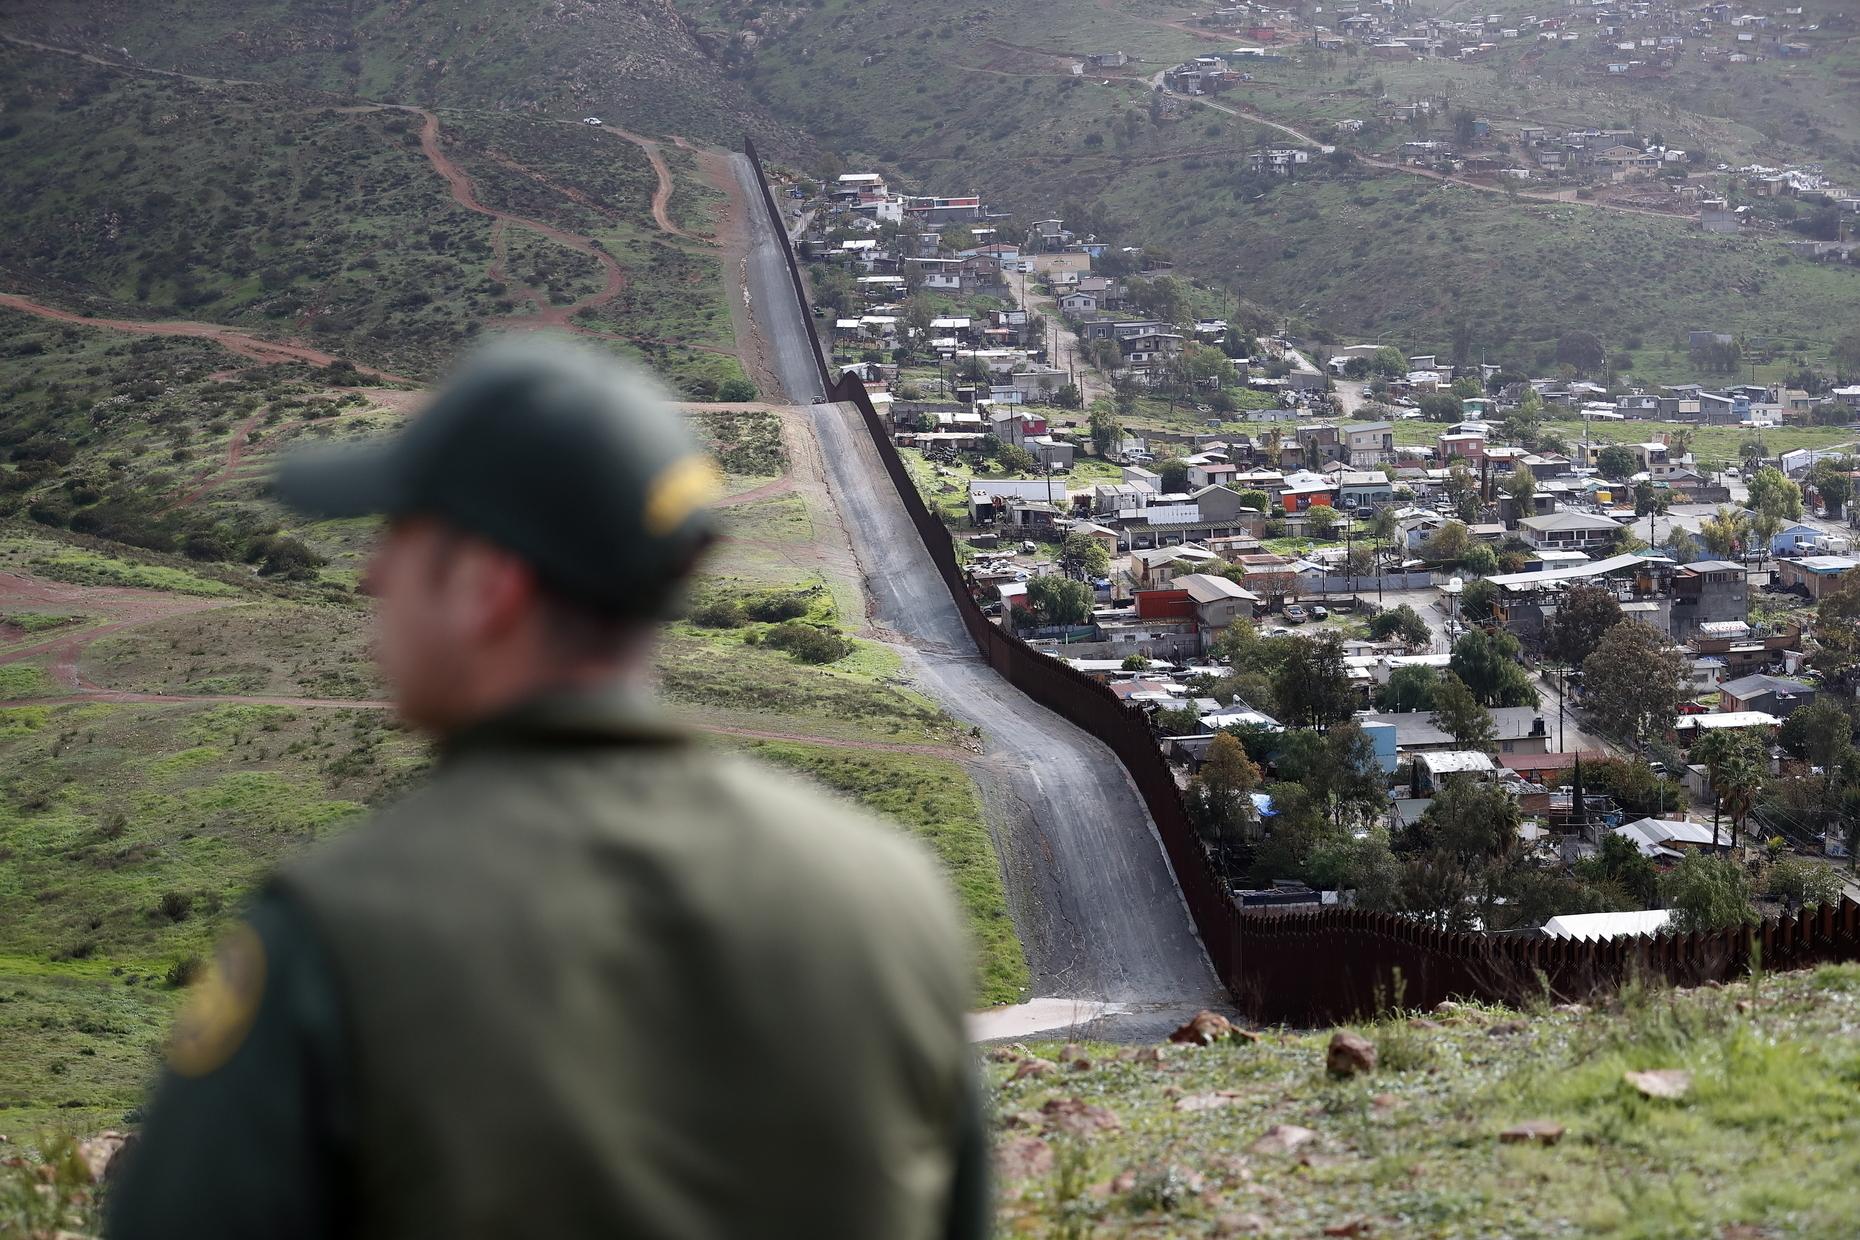 82 babies born to migrant women in Juarez since 2018